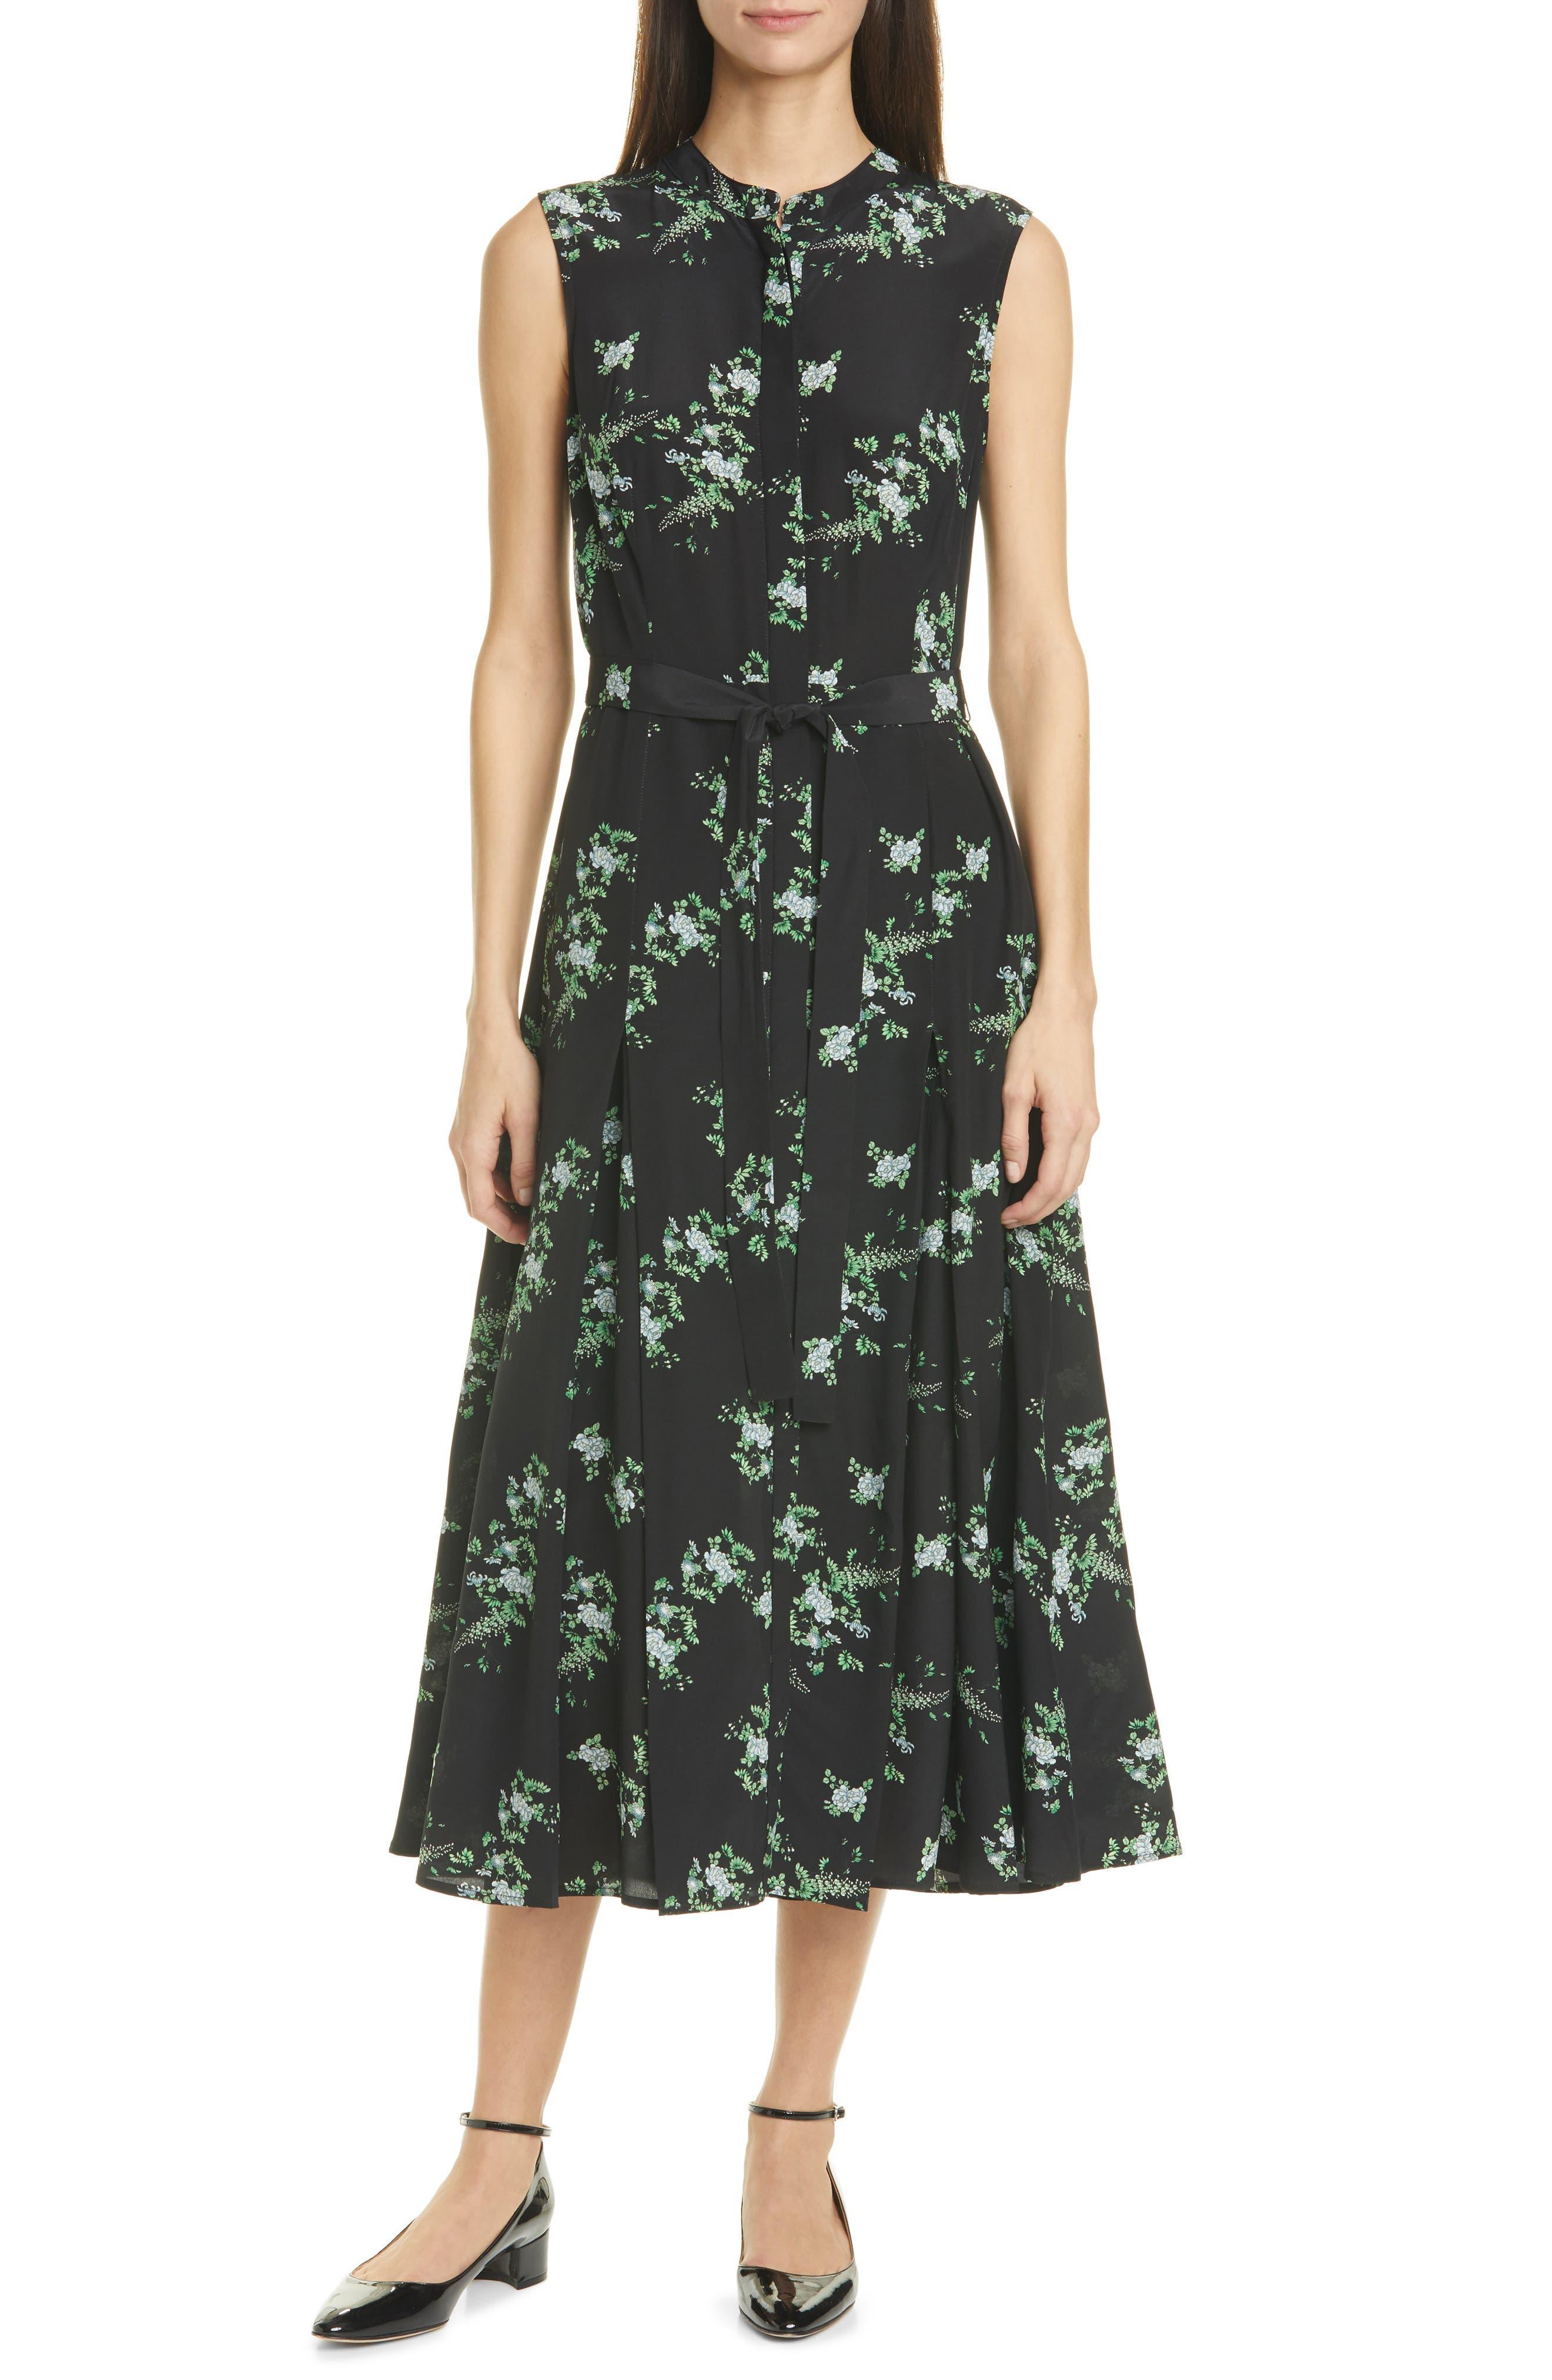 Salerno Floral Print Sleeveless Dress